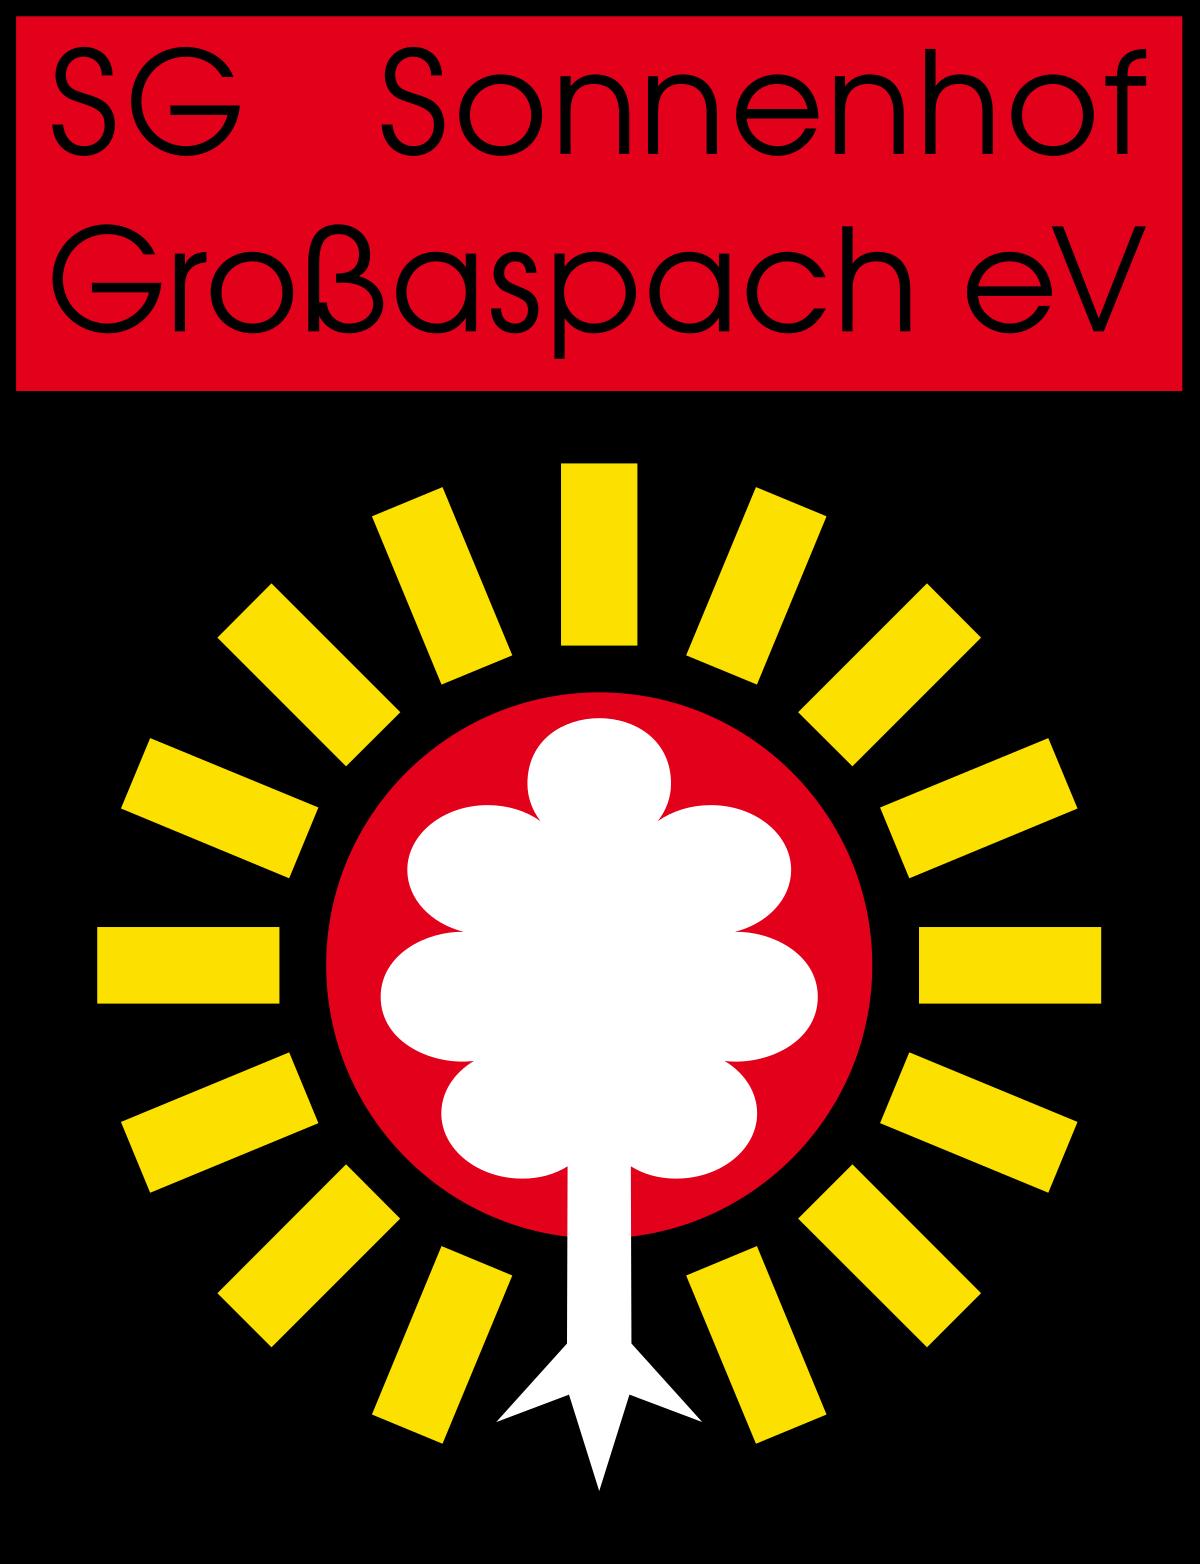 1200px-SG-Sonnenhof-Gro-aspach-logo-svg.